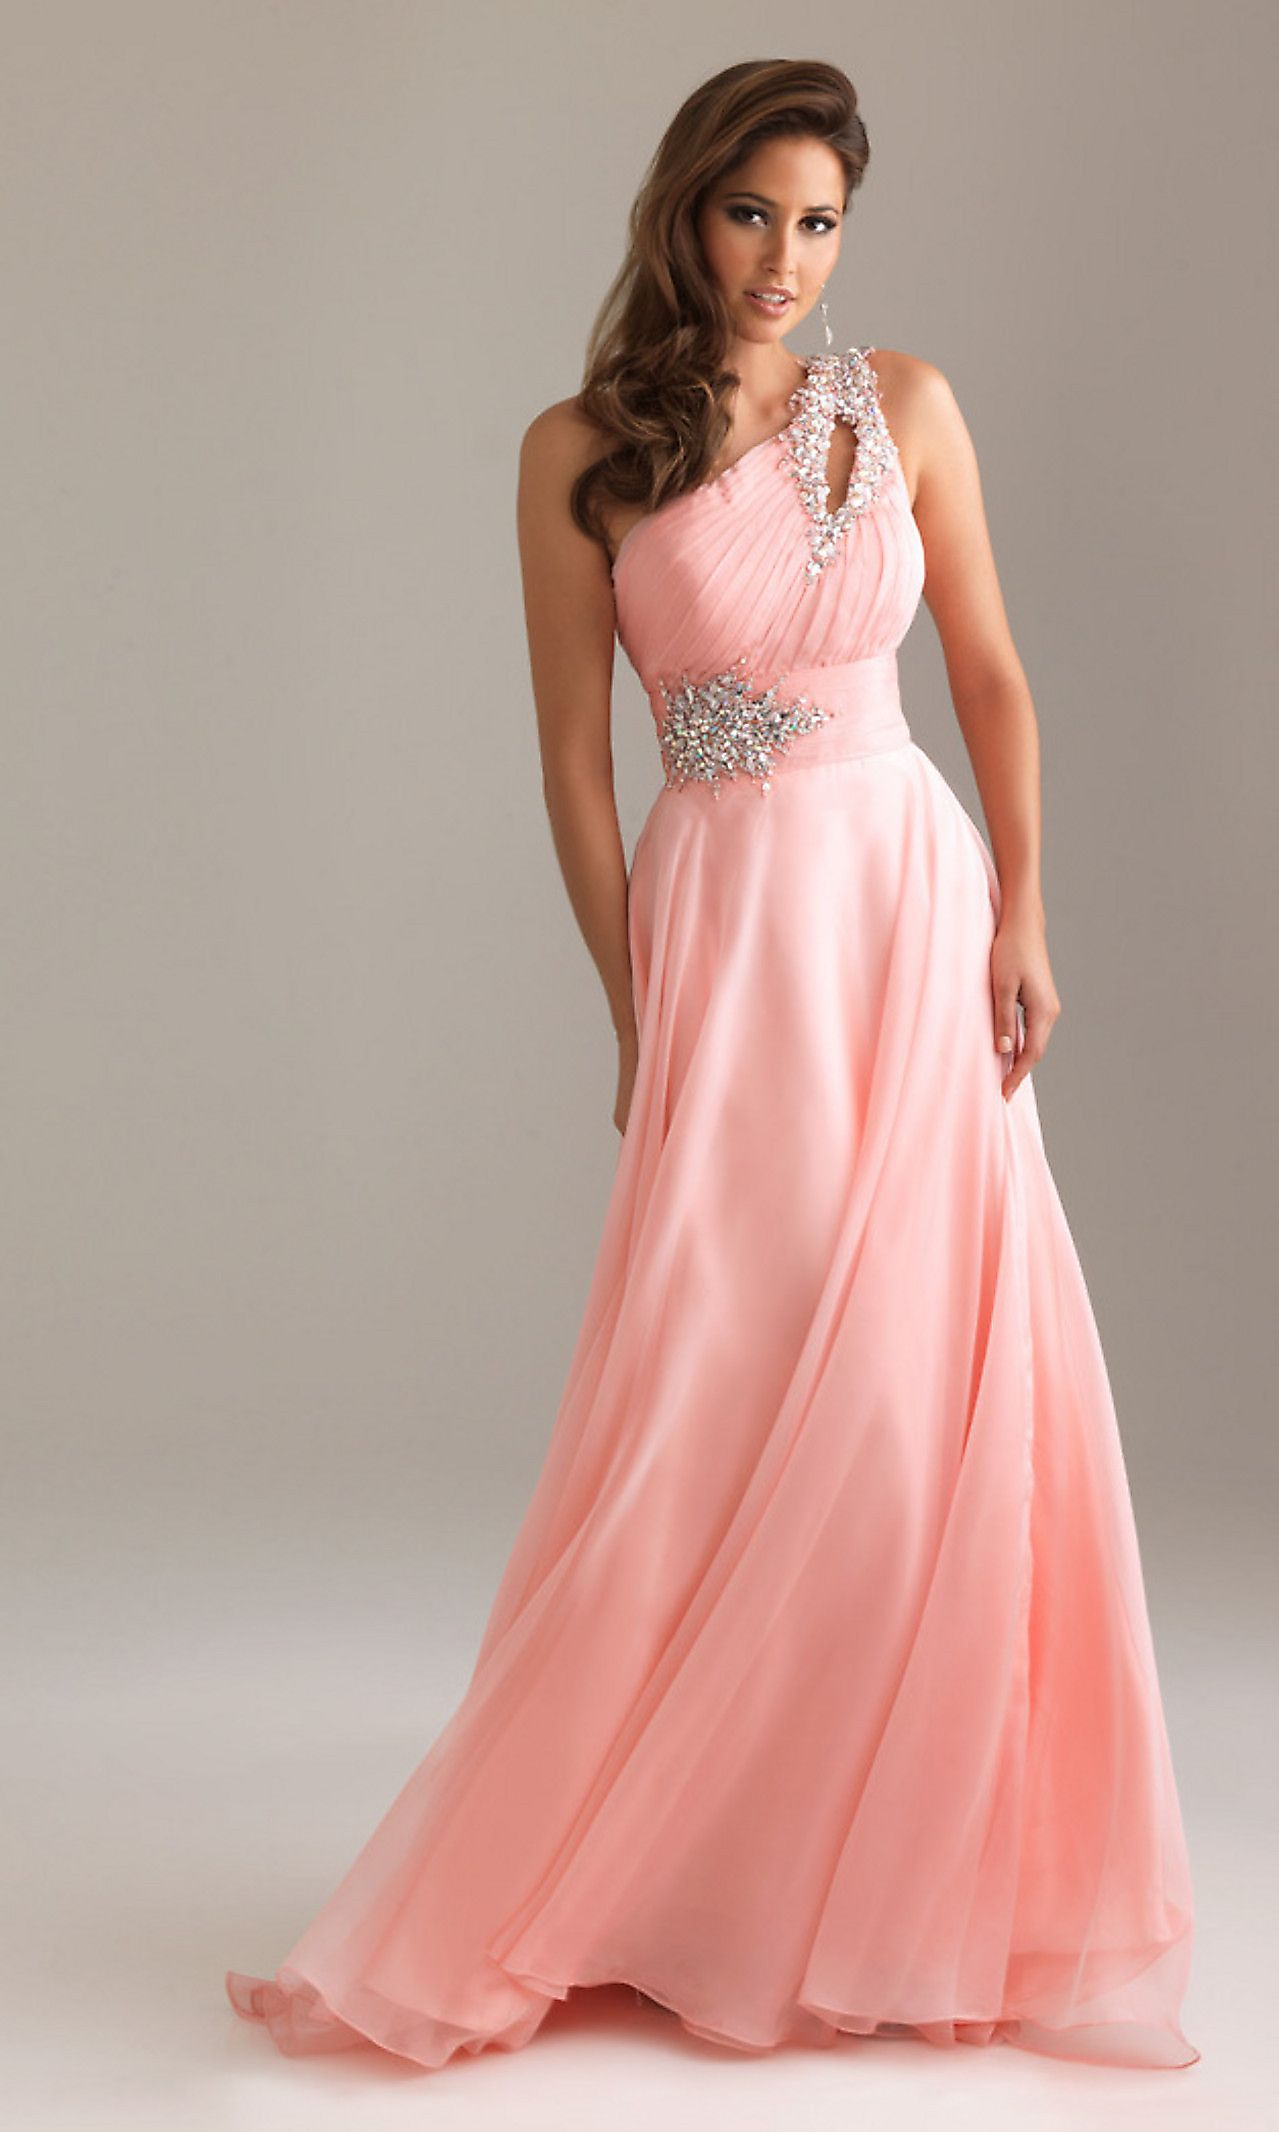 pretty prom dress | bestidos | Pinterest | Hermosa, Vestiditos y ...